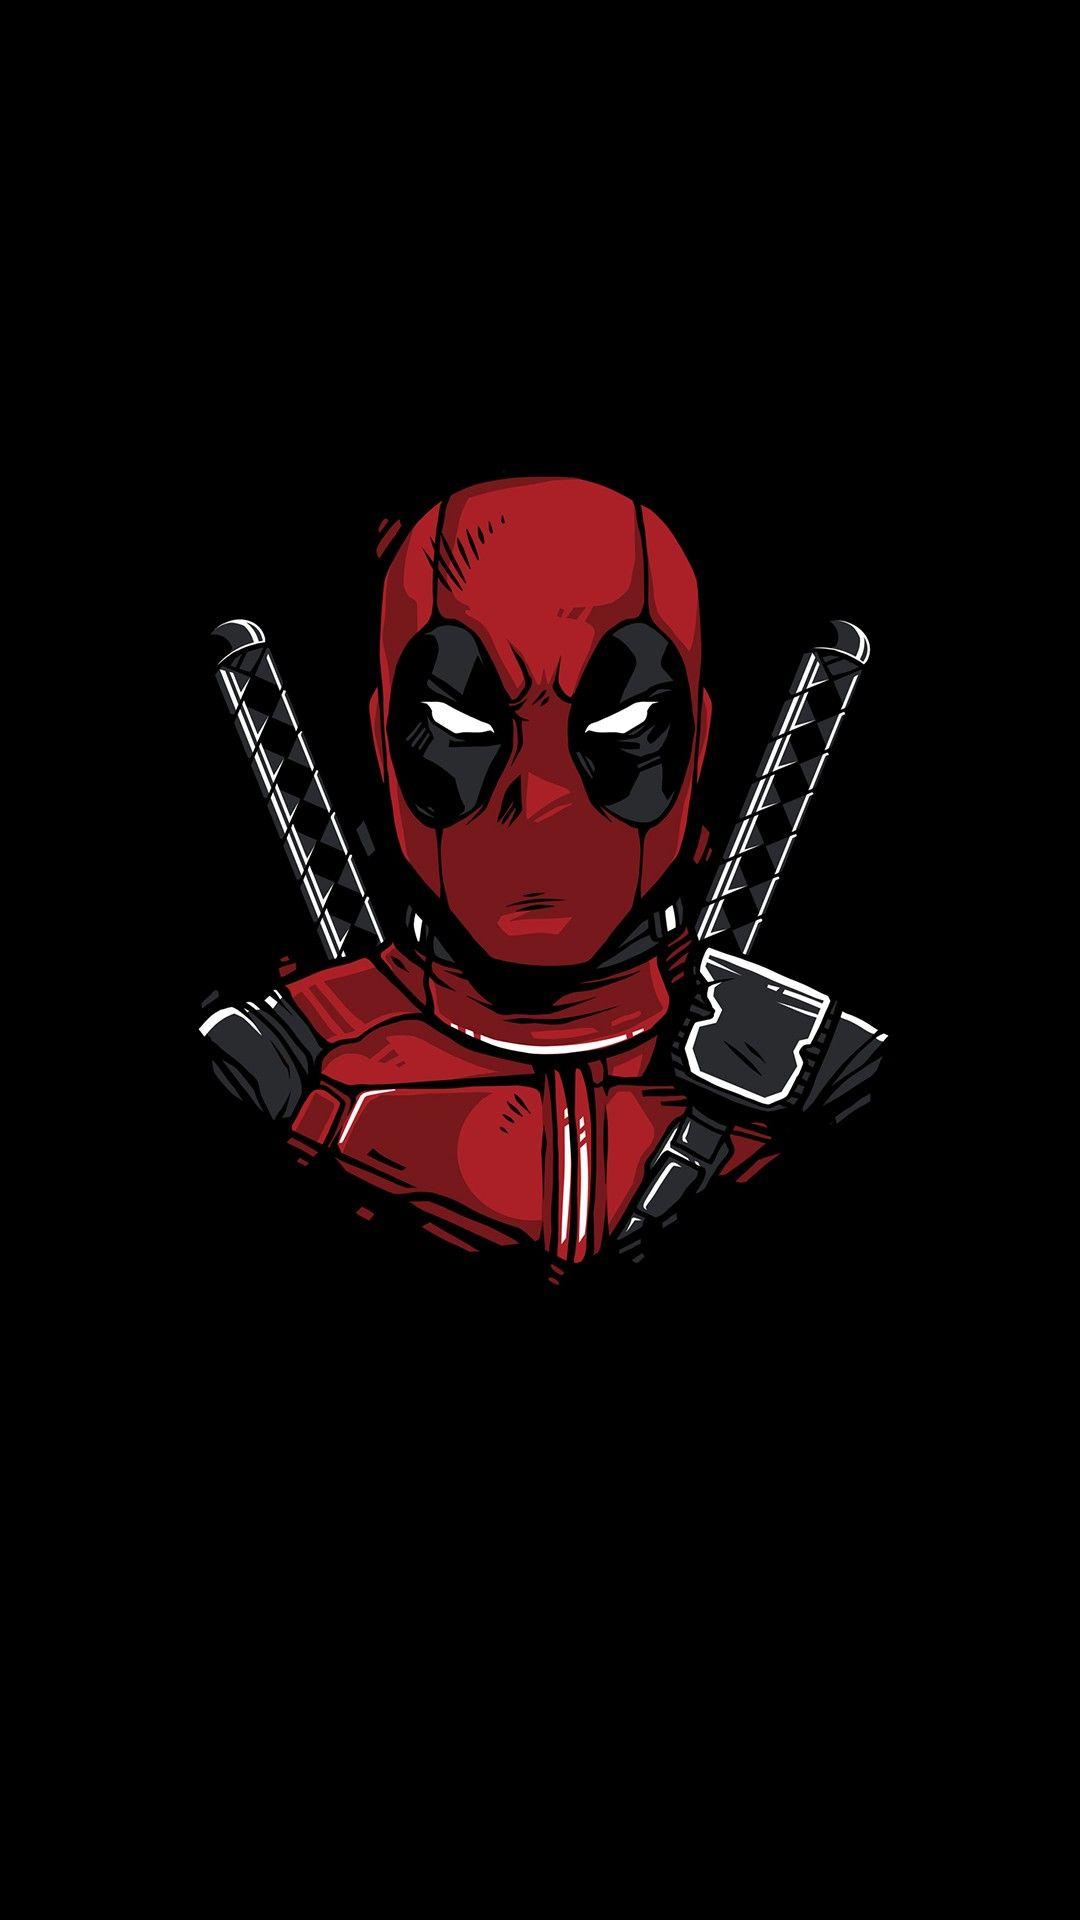 Download Deadpool Wallpaper For Iphone W Wallpapers In 2020 Deadpool Art Deadpool Wallpaper Superhero Wallpaper